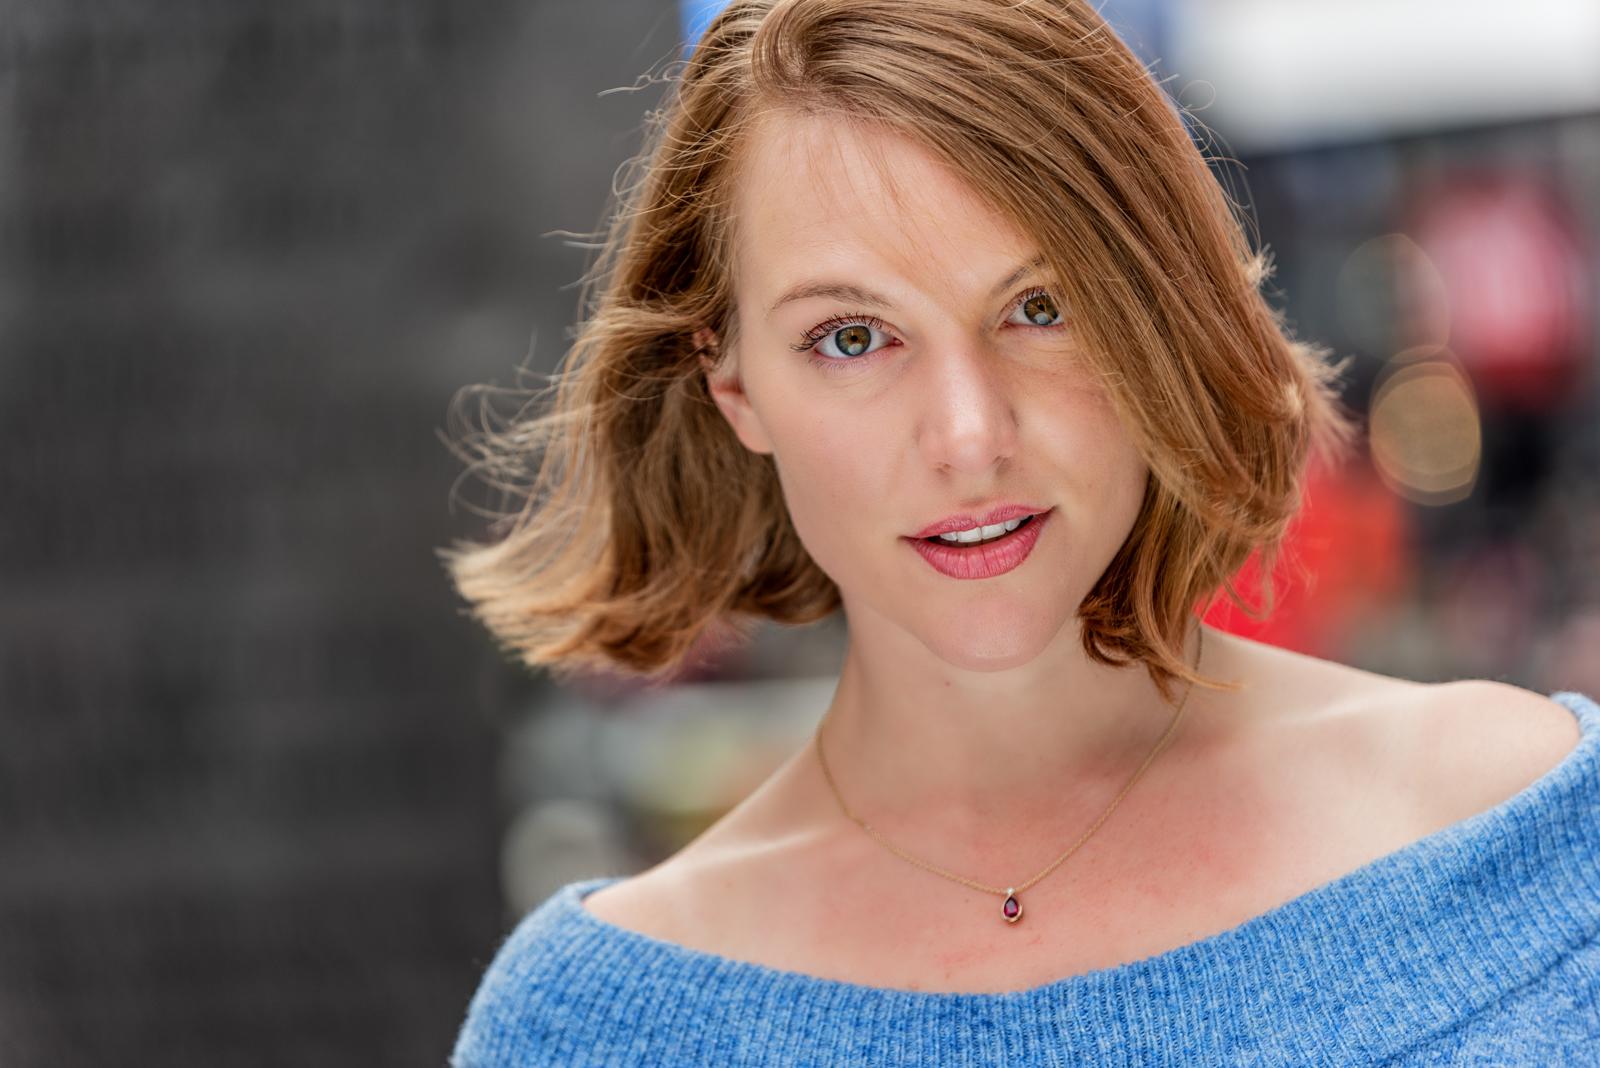 Kelsey Mourant